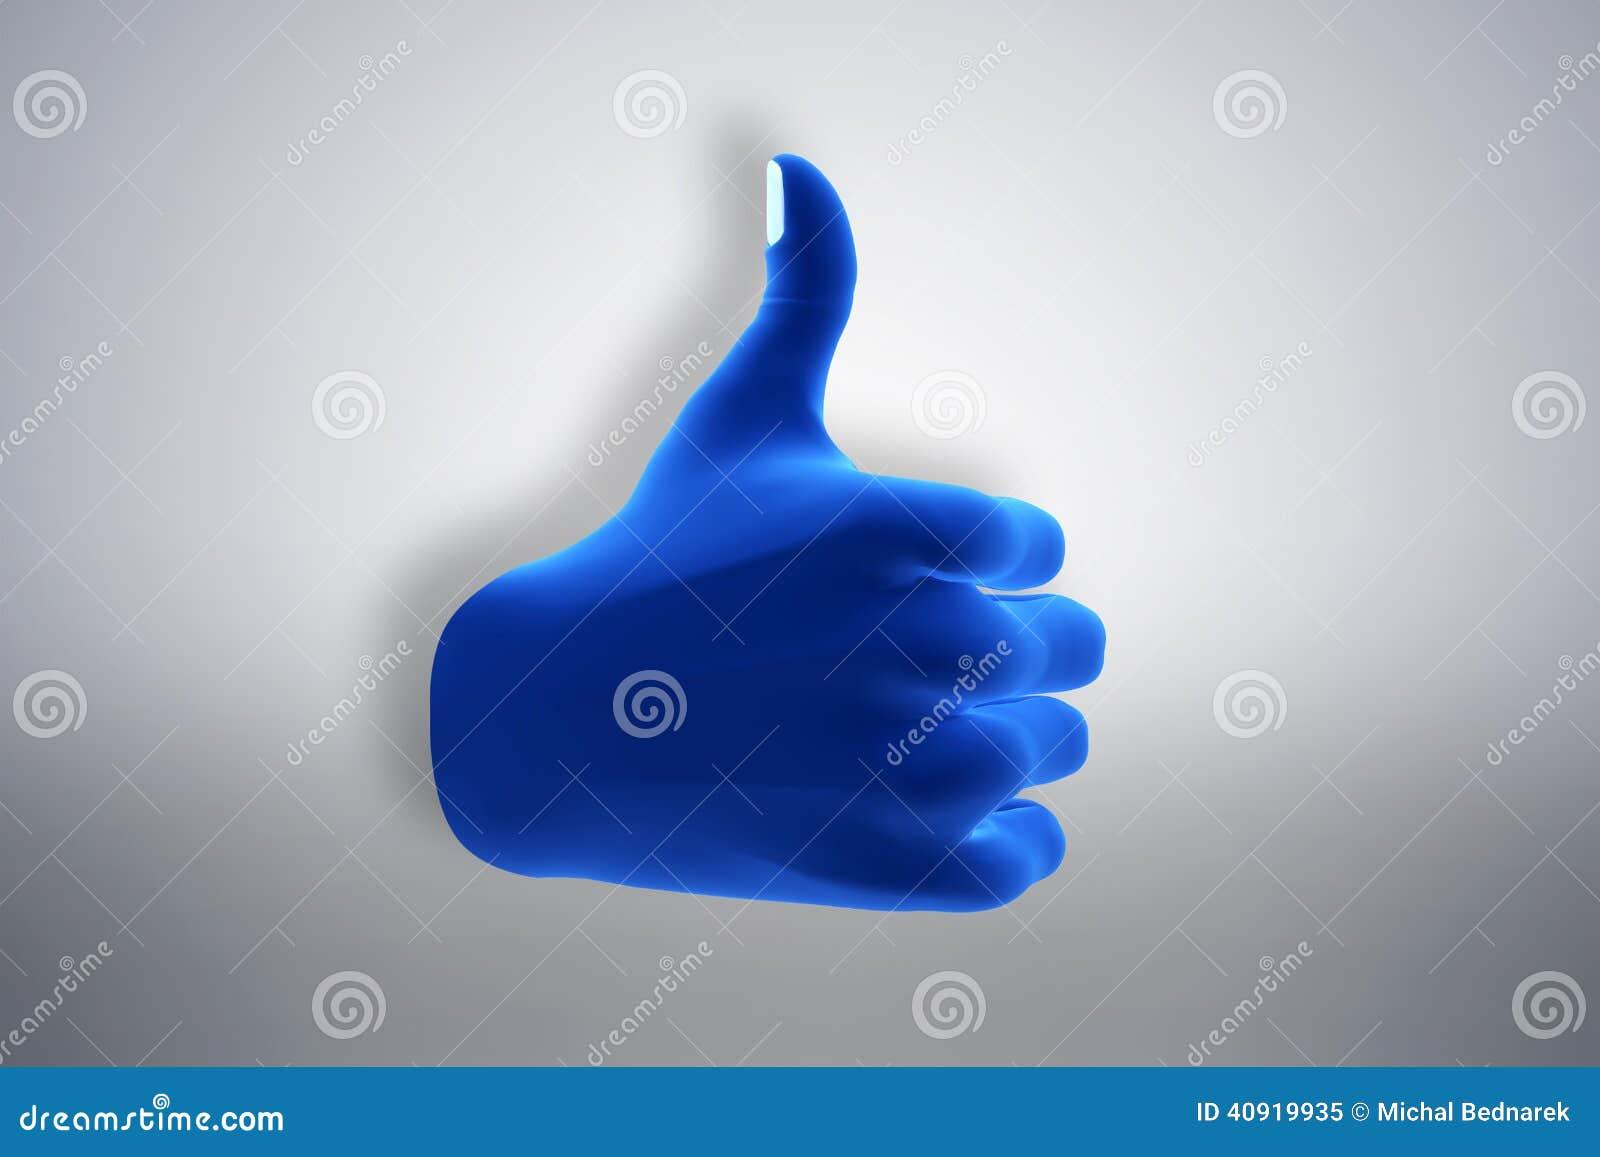 Blue hand gesture showing OK, like, agree.